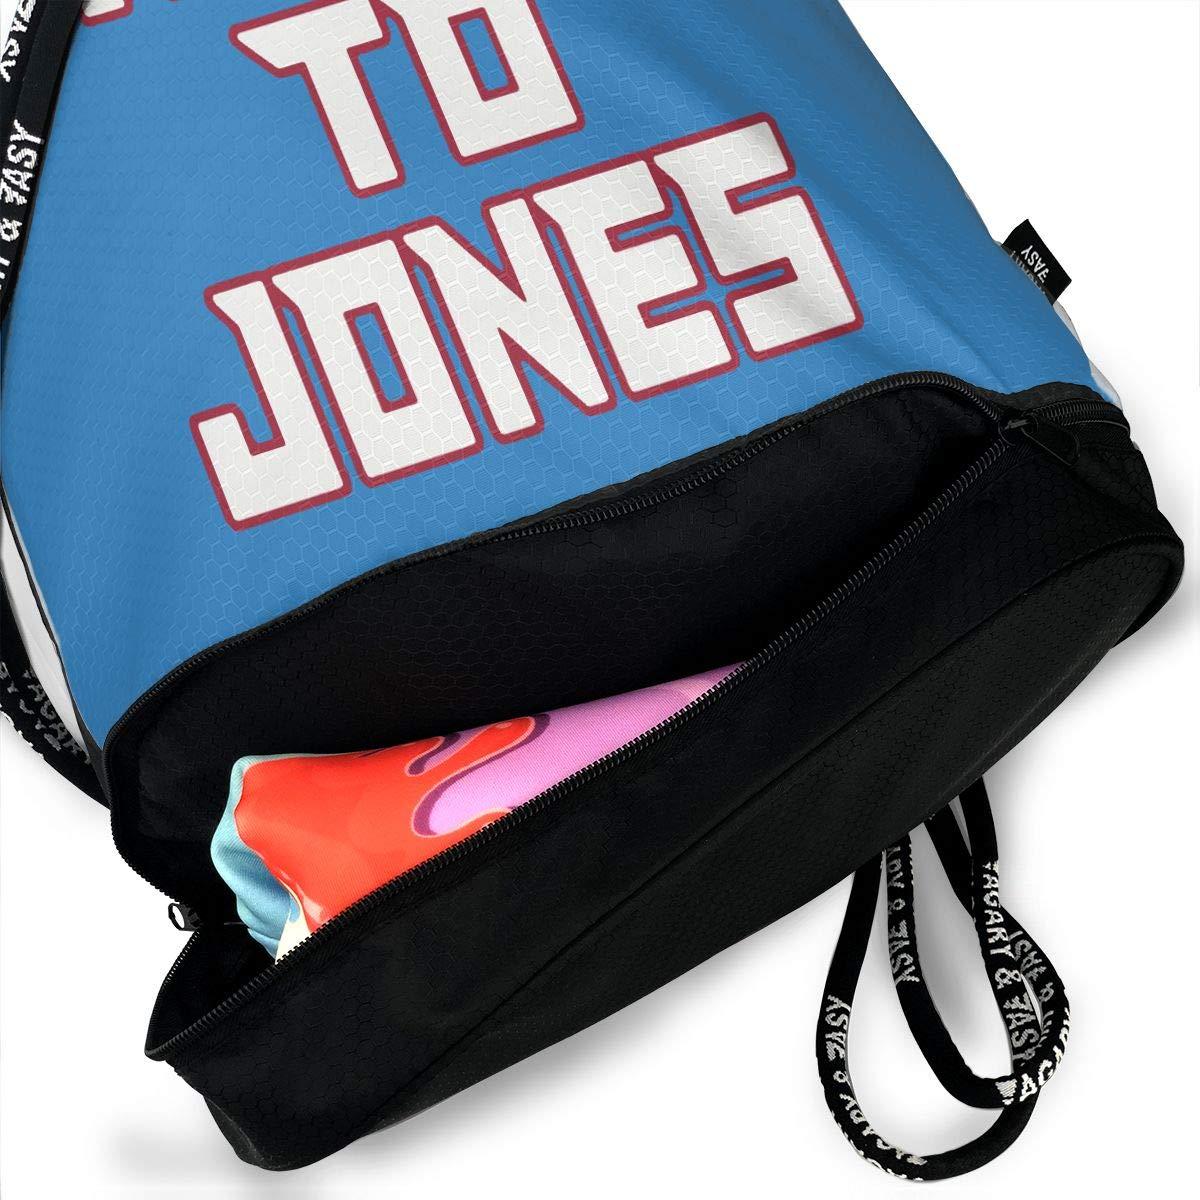 Drawstring Bag Atlanta Ryan To Jones Gym Bag Sport Backpack Shoulder Bags Travel College Rucksack